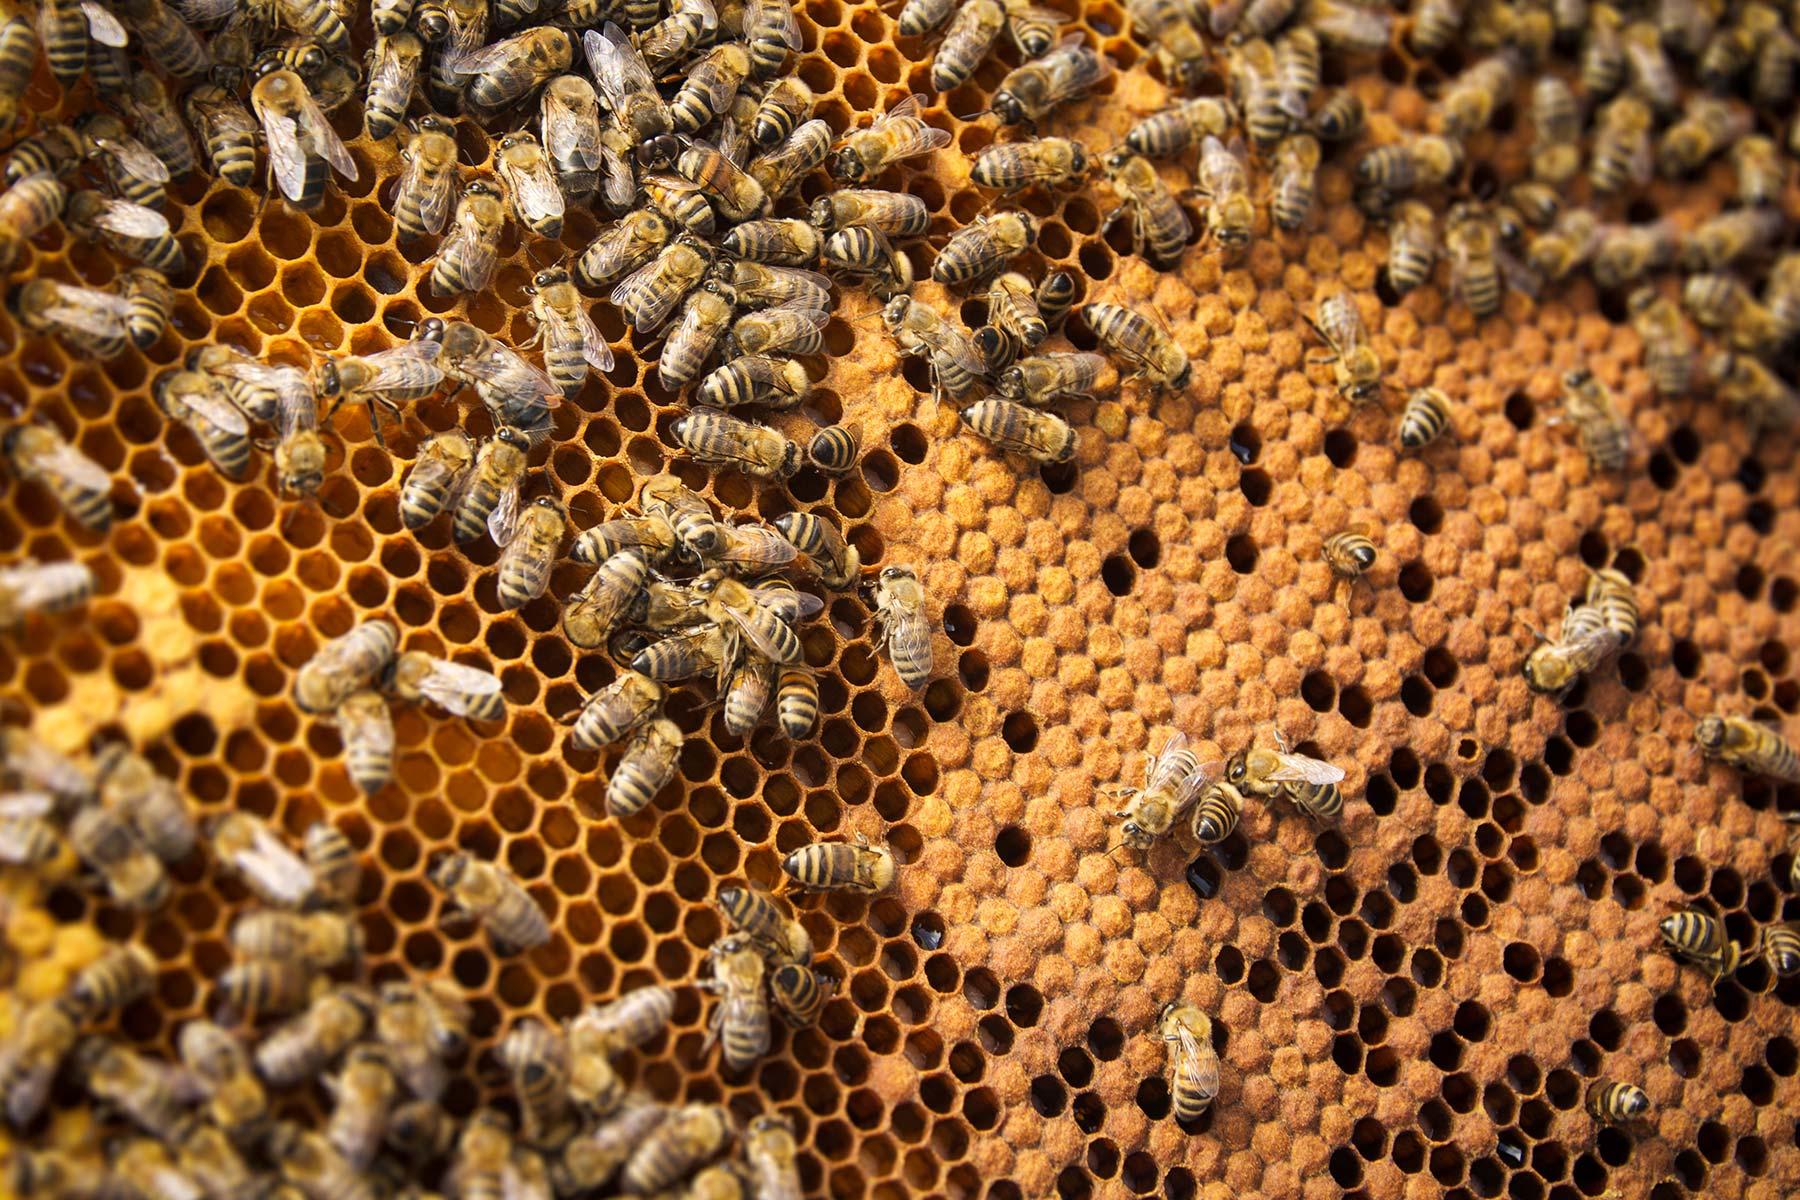 Moku virus highlights potential threat to pollinators worldwide